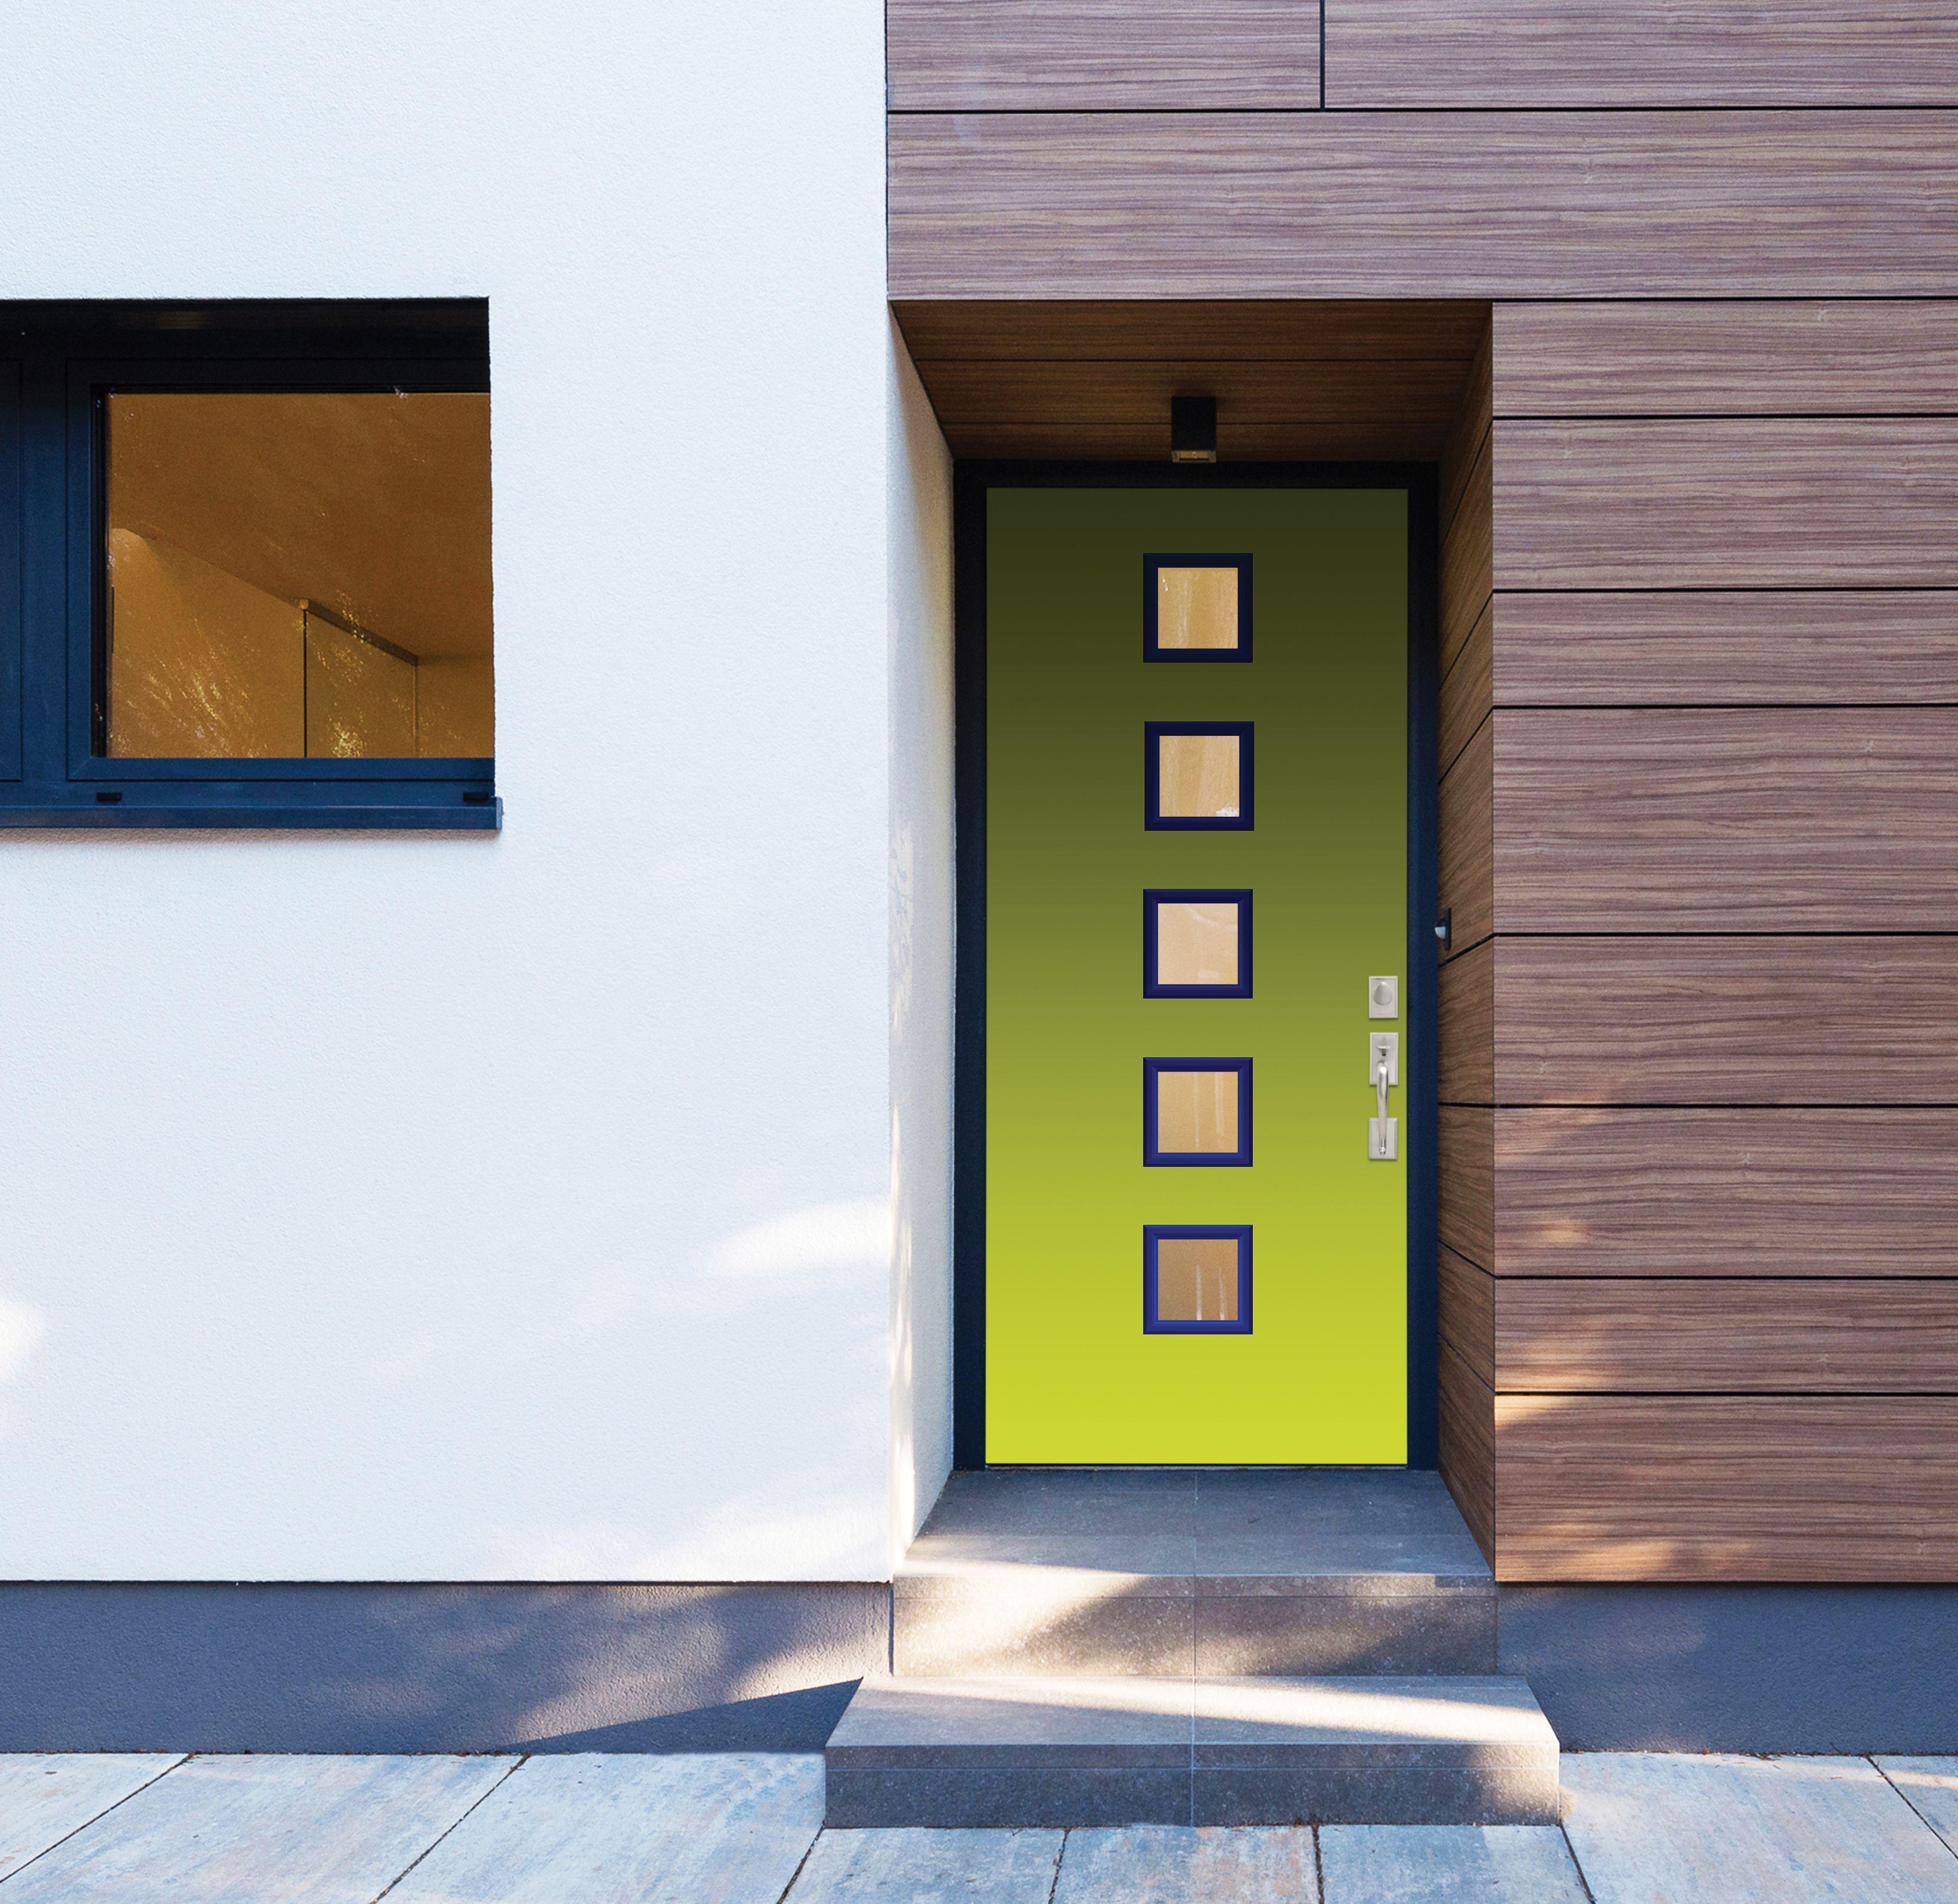 Masonite HD Steel Modern Green Door | Masonite® Exterior Doors in on